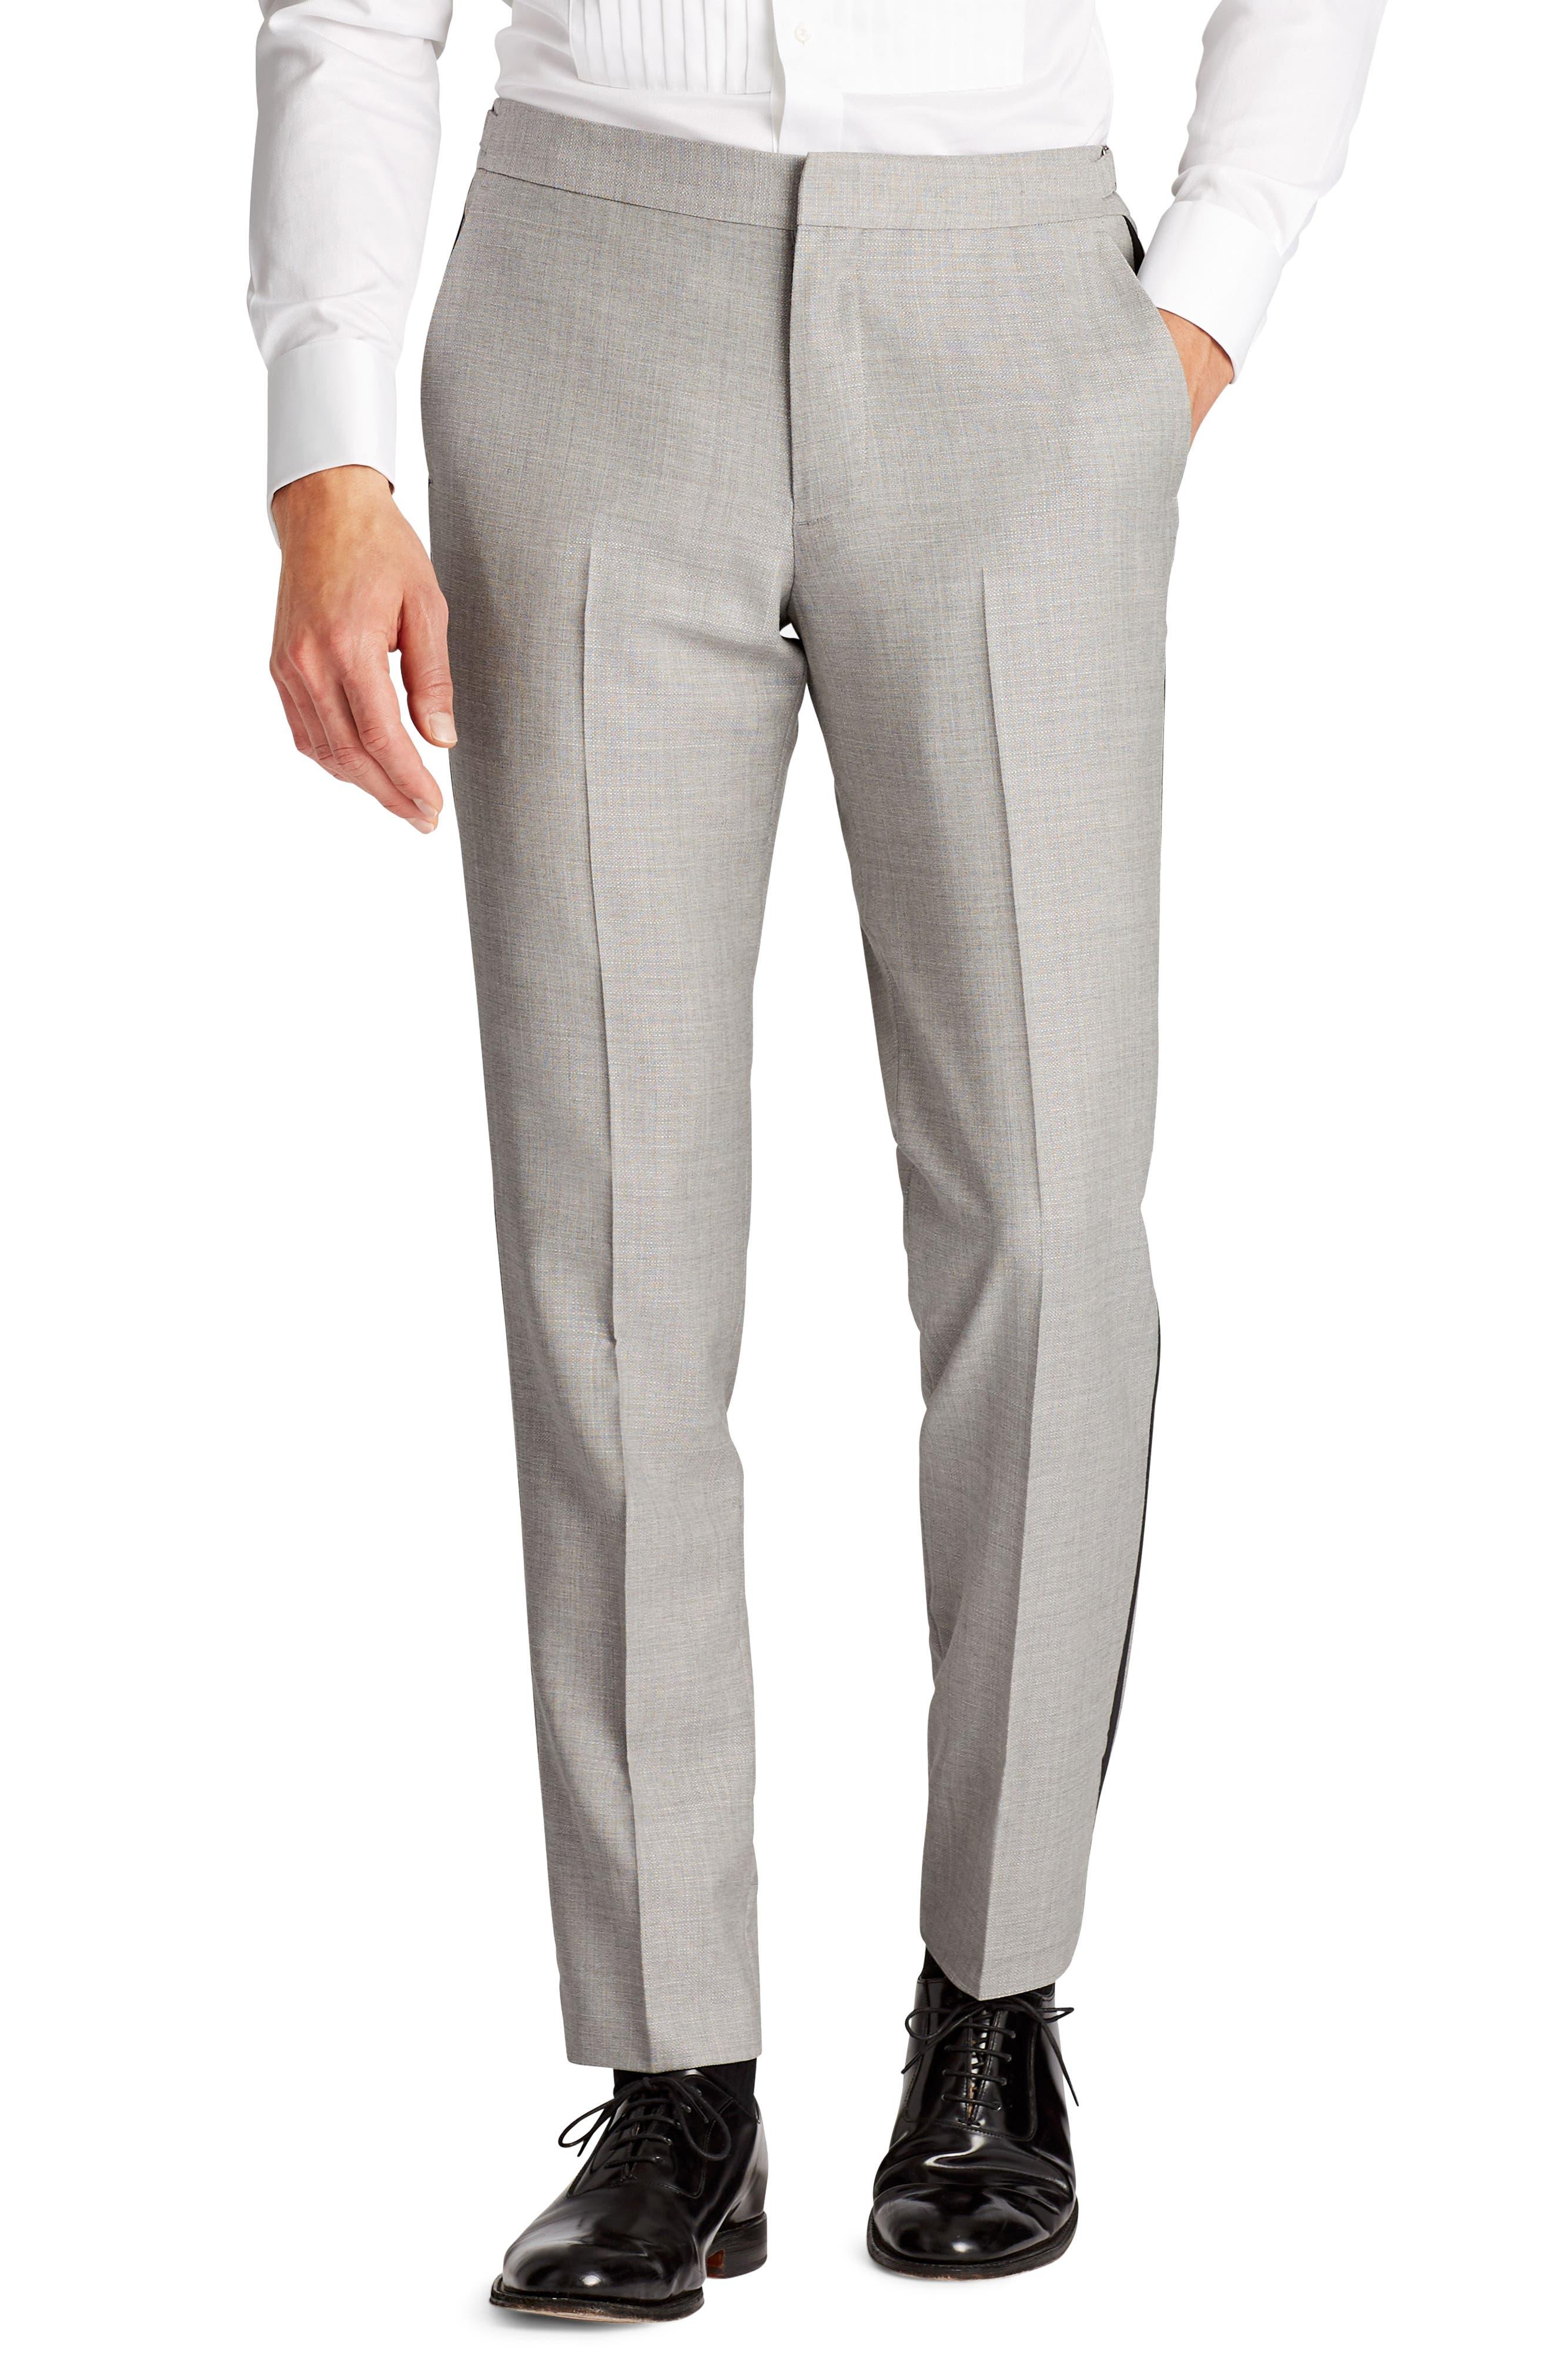 Capstone Flat Front Tuxedo Trousers,                         Main,                         color, 020